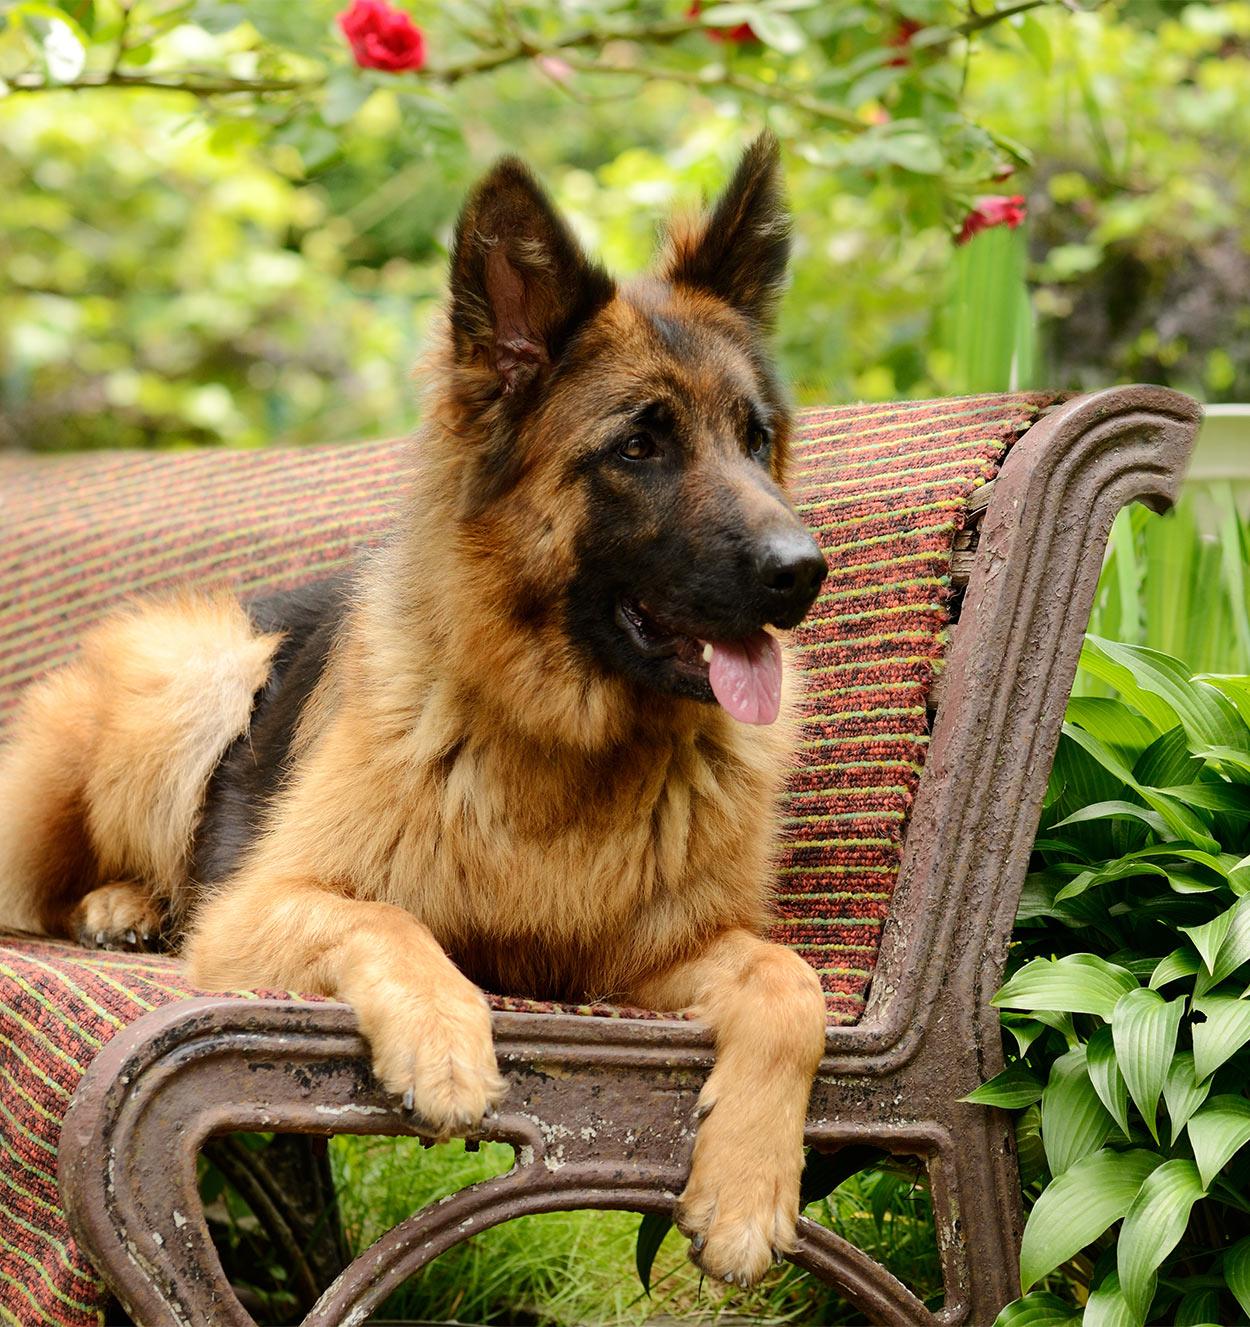 German Shepherd on a bench